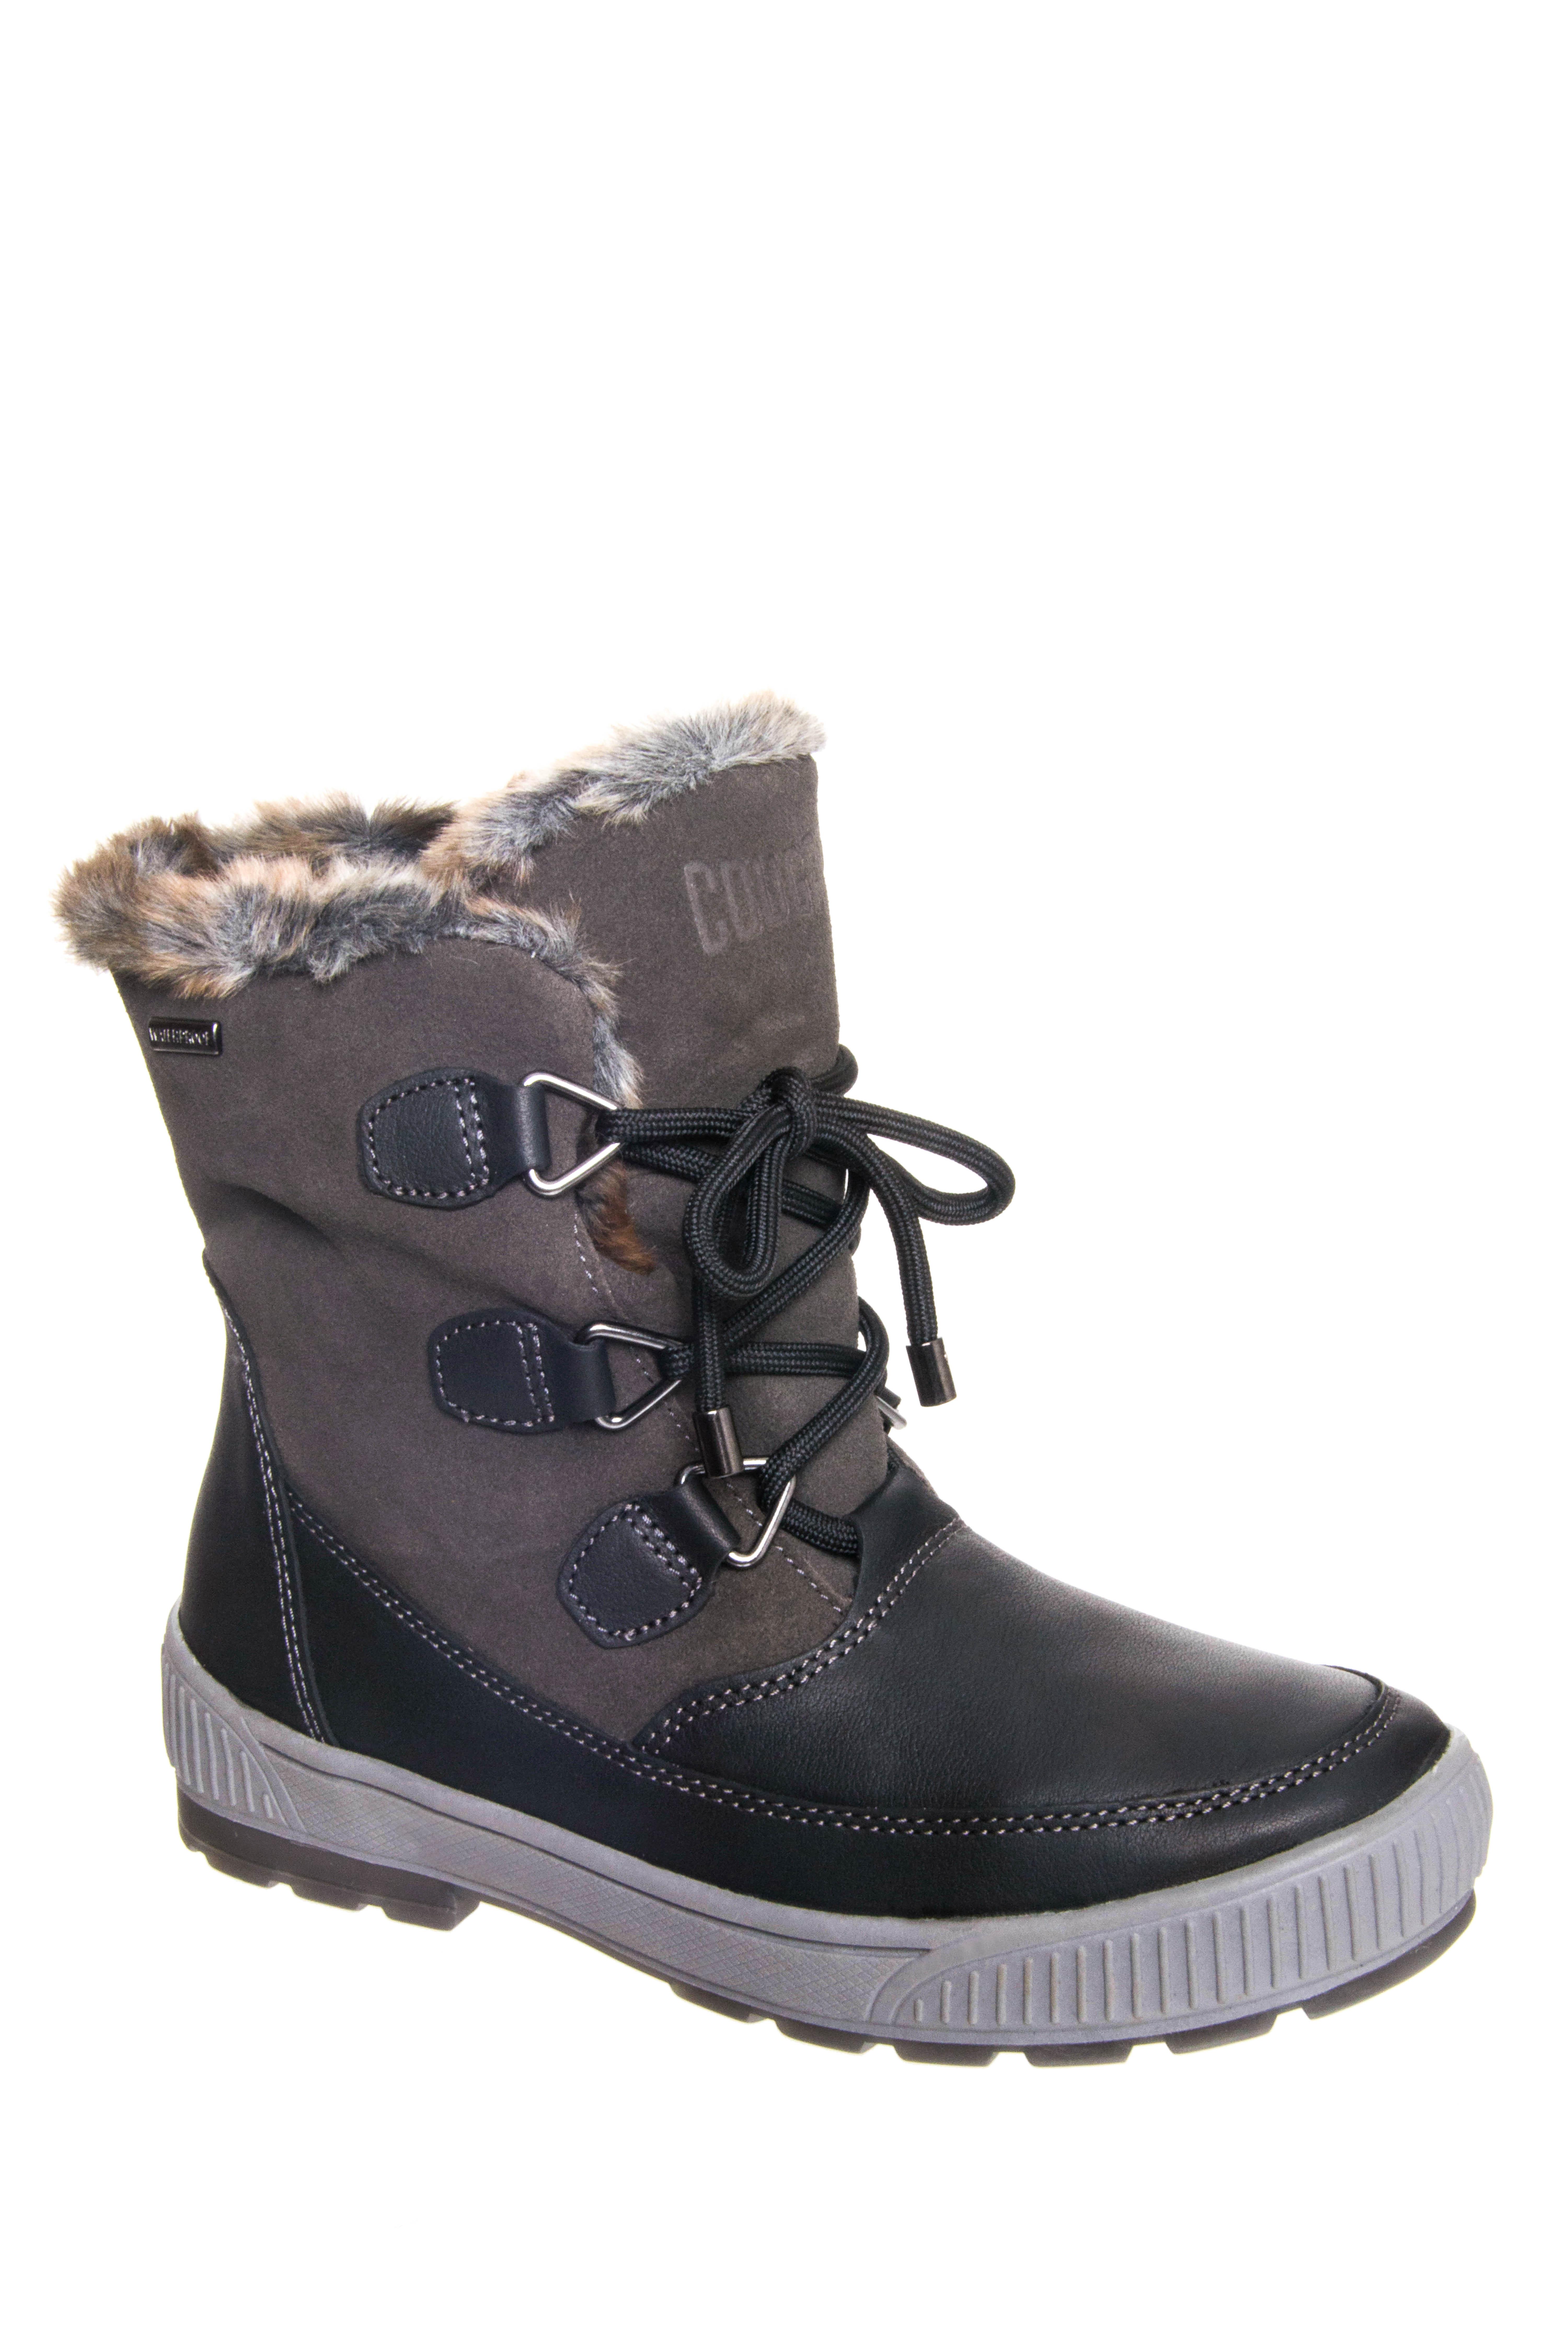 Cougar Wilson Snow Boots - Black Gum